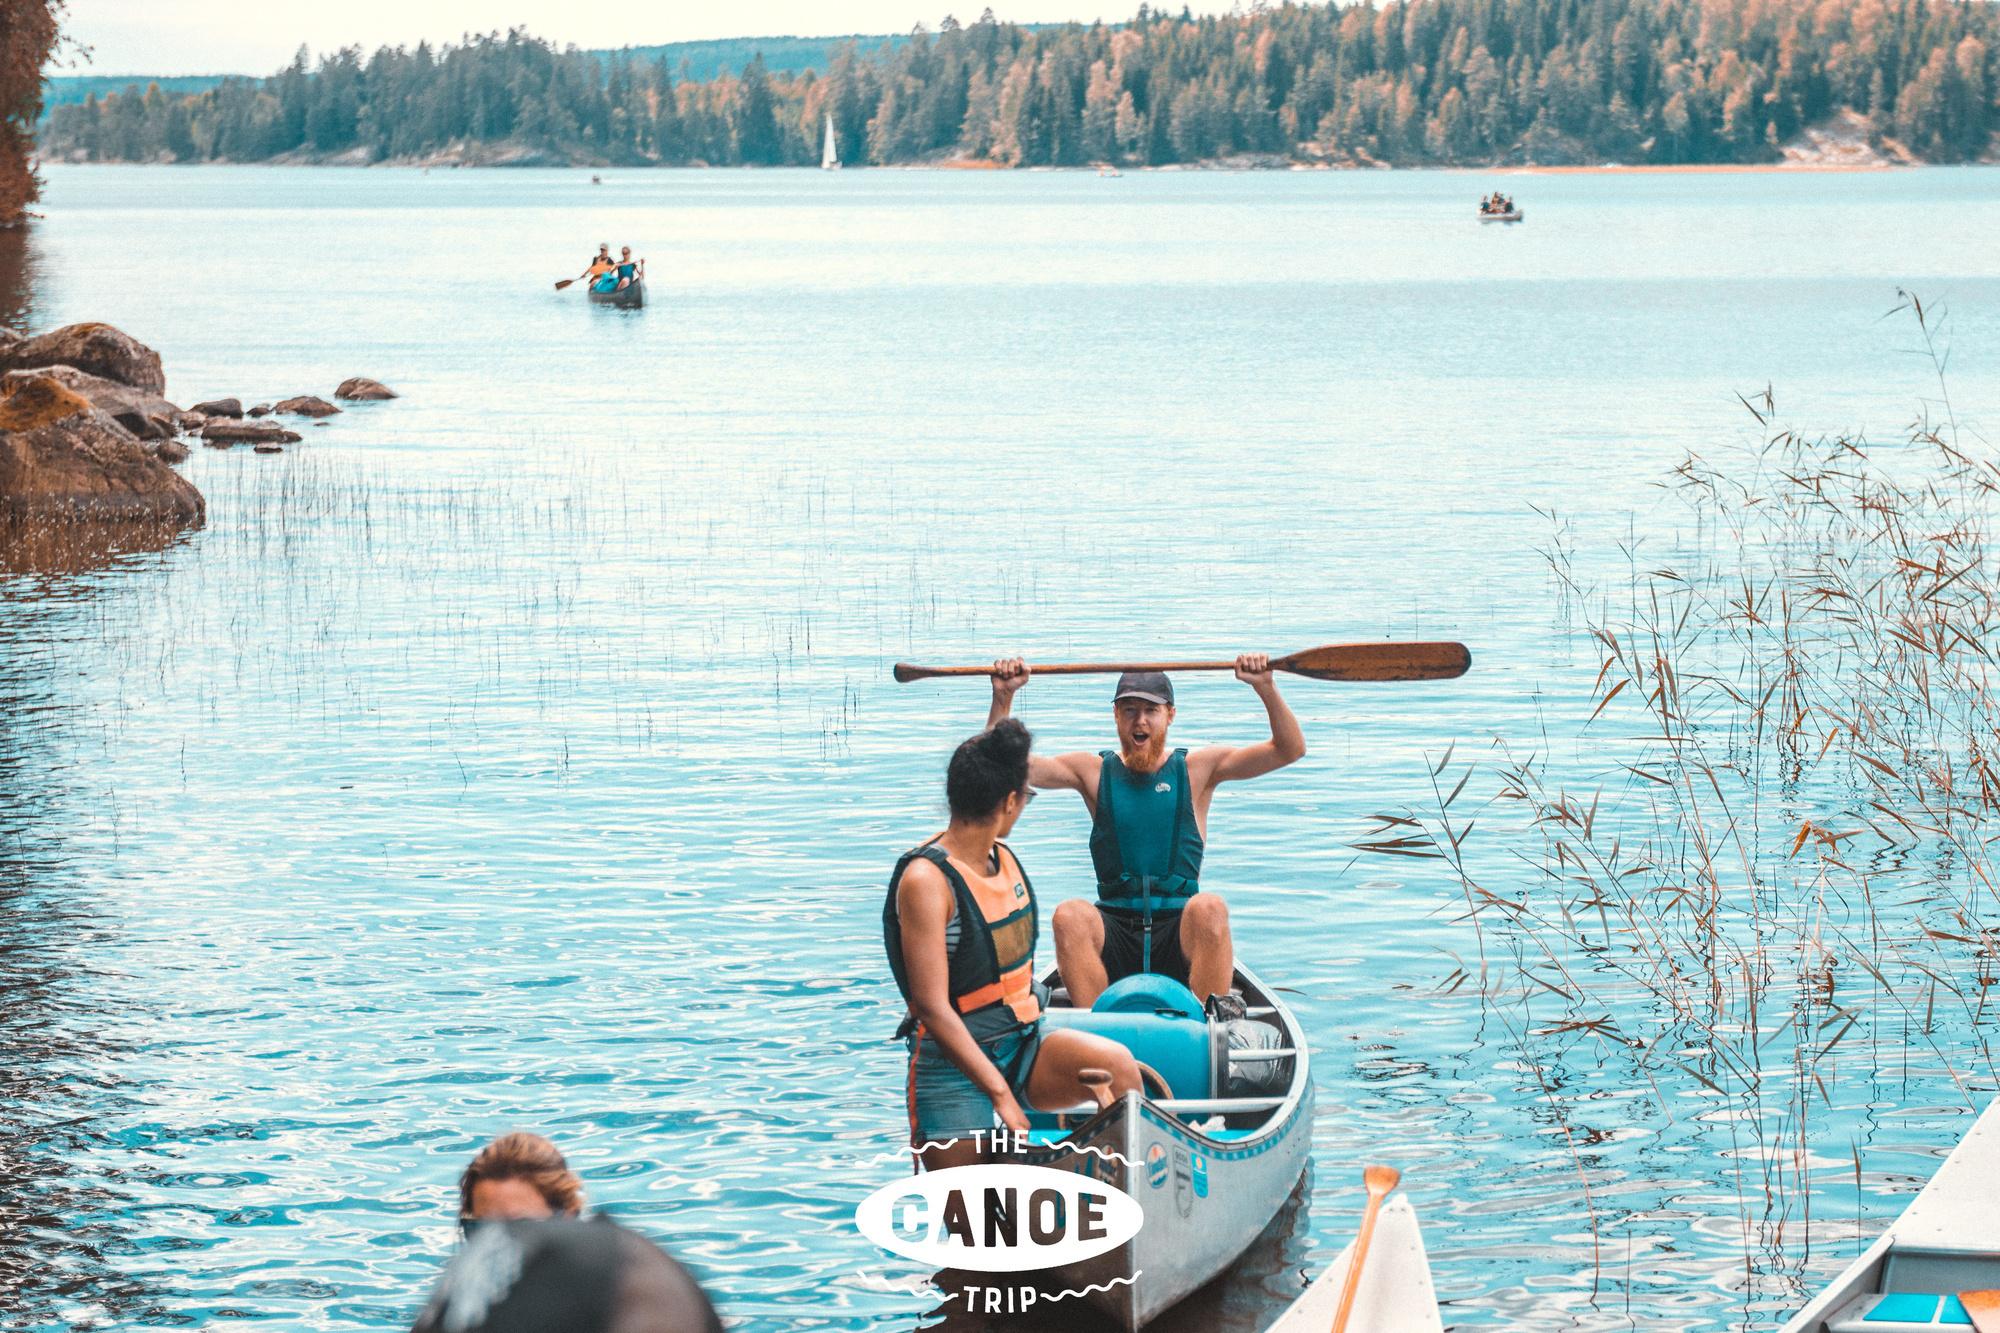 Op kano-trip in Scandinavië., Travelbase